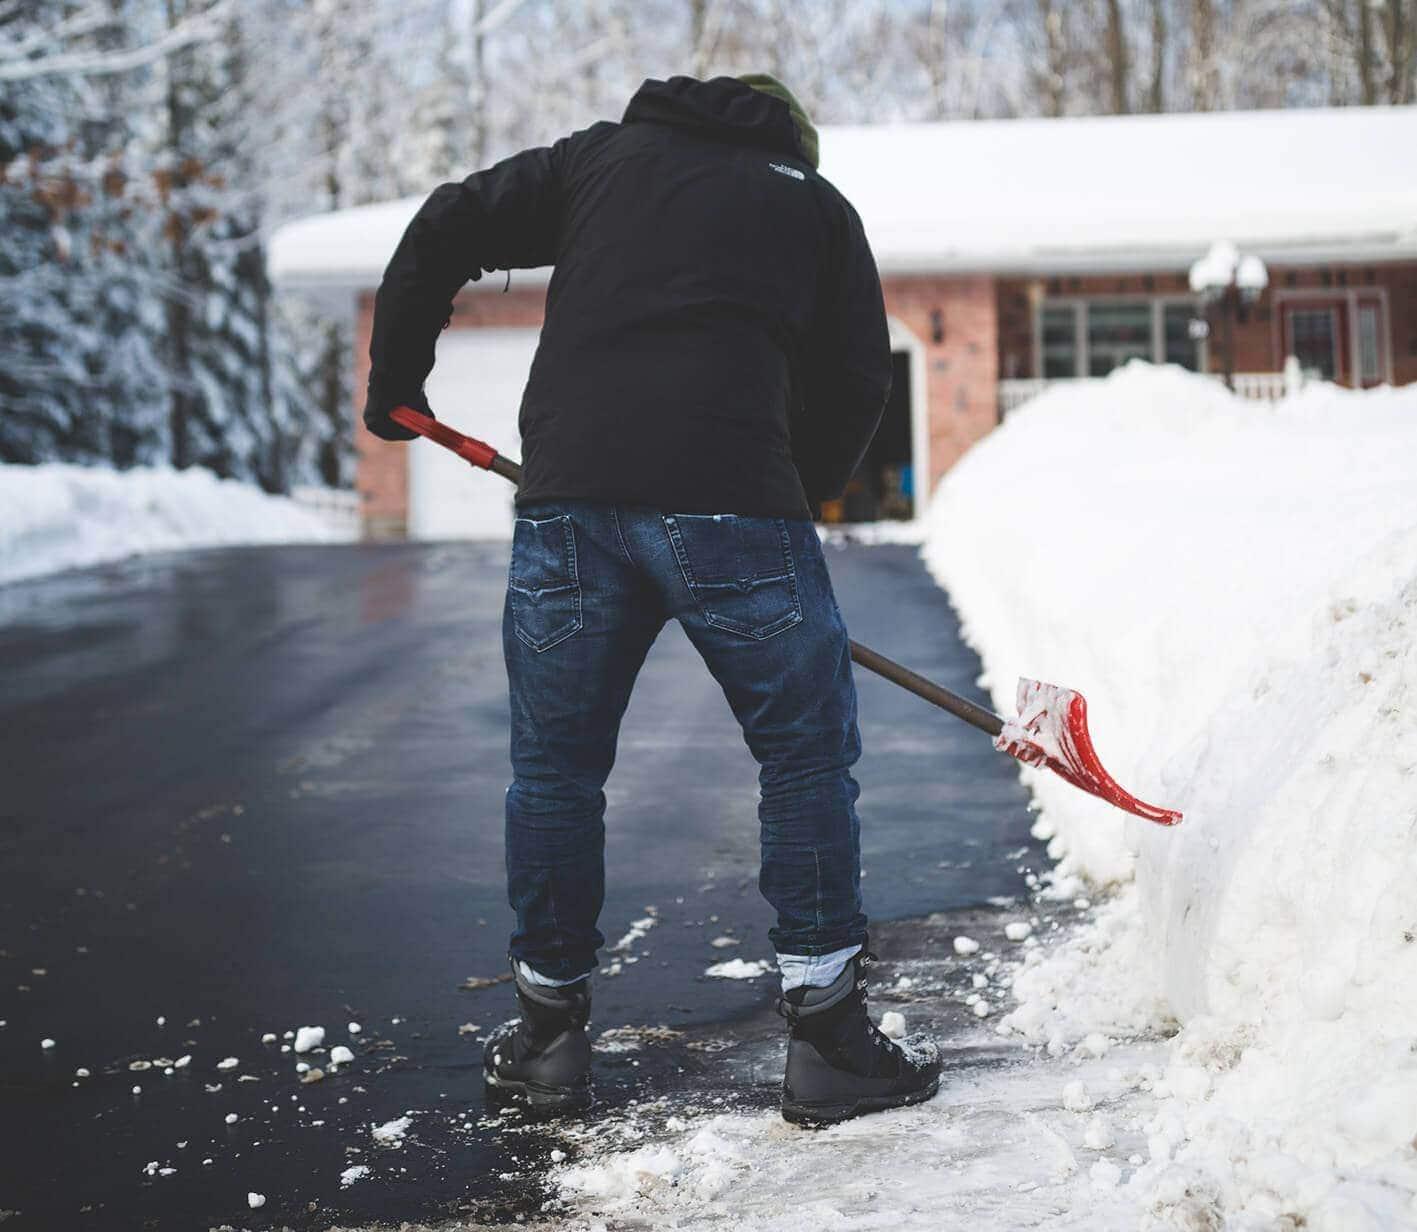 Man removing snow